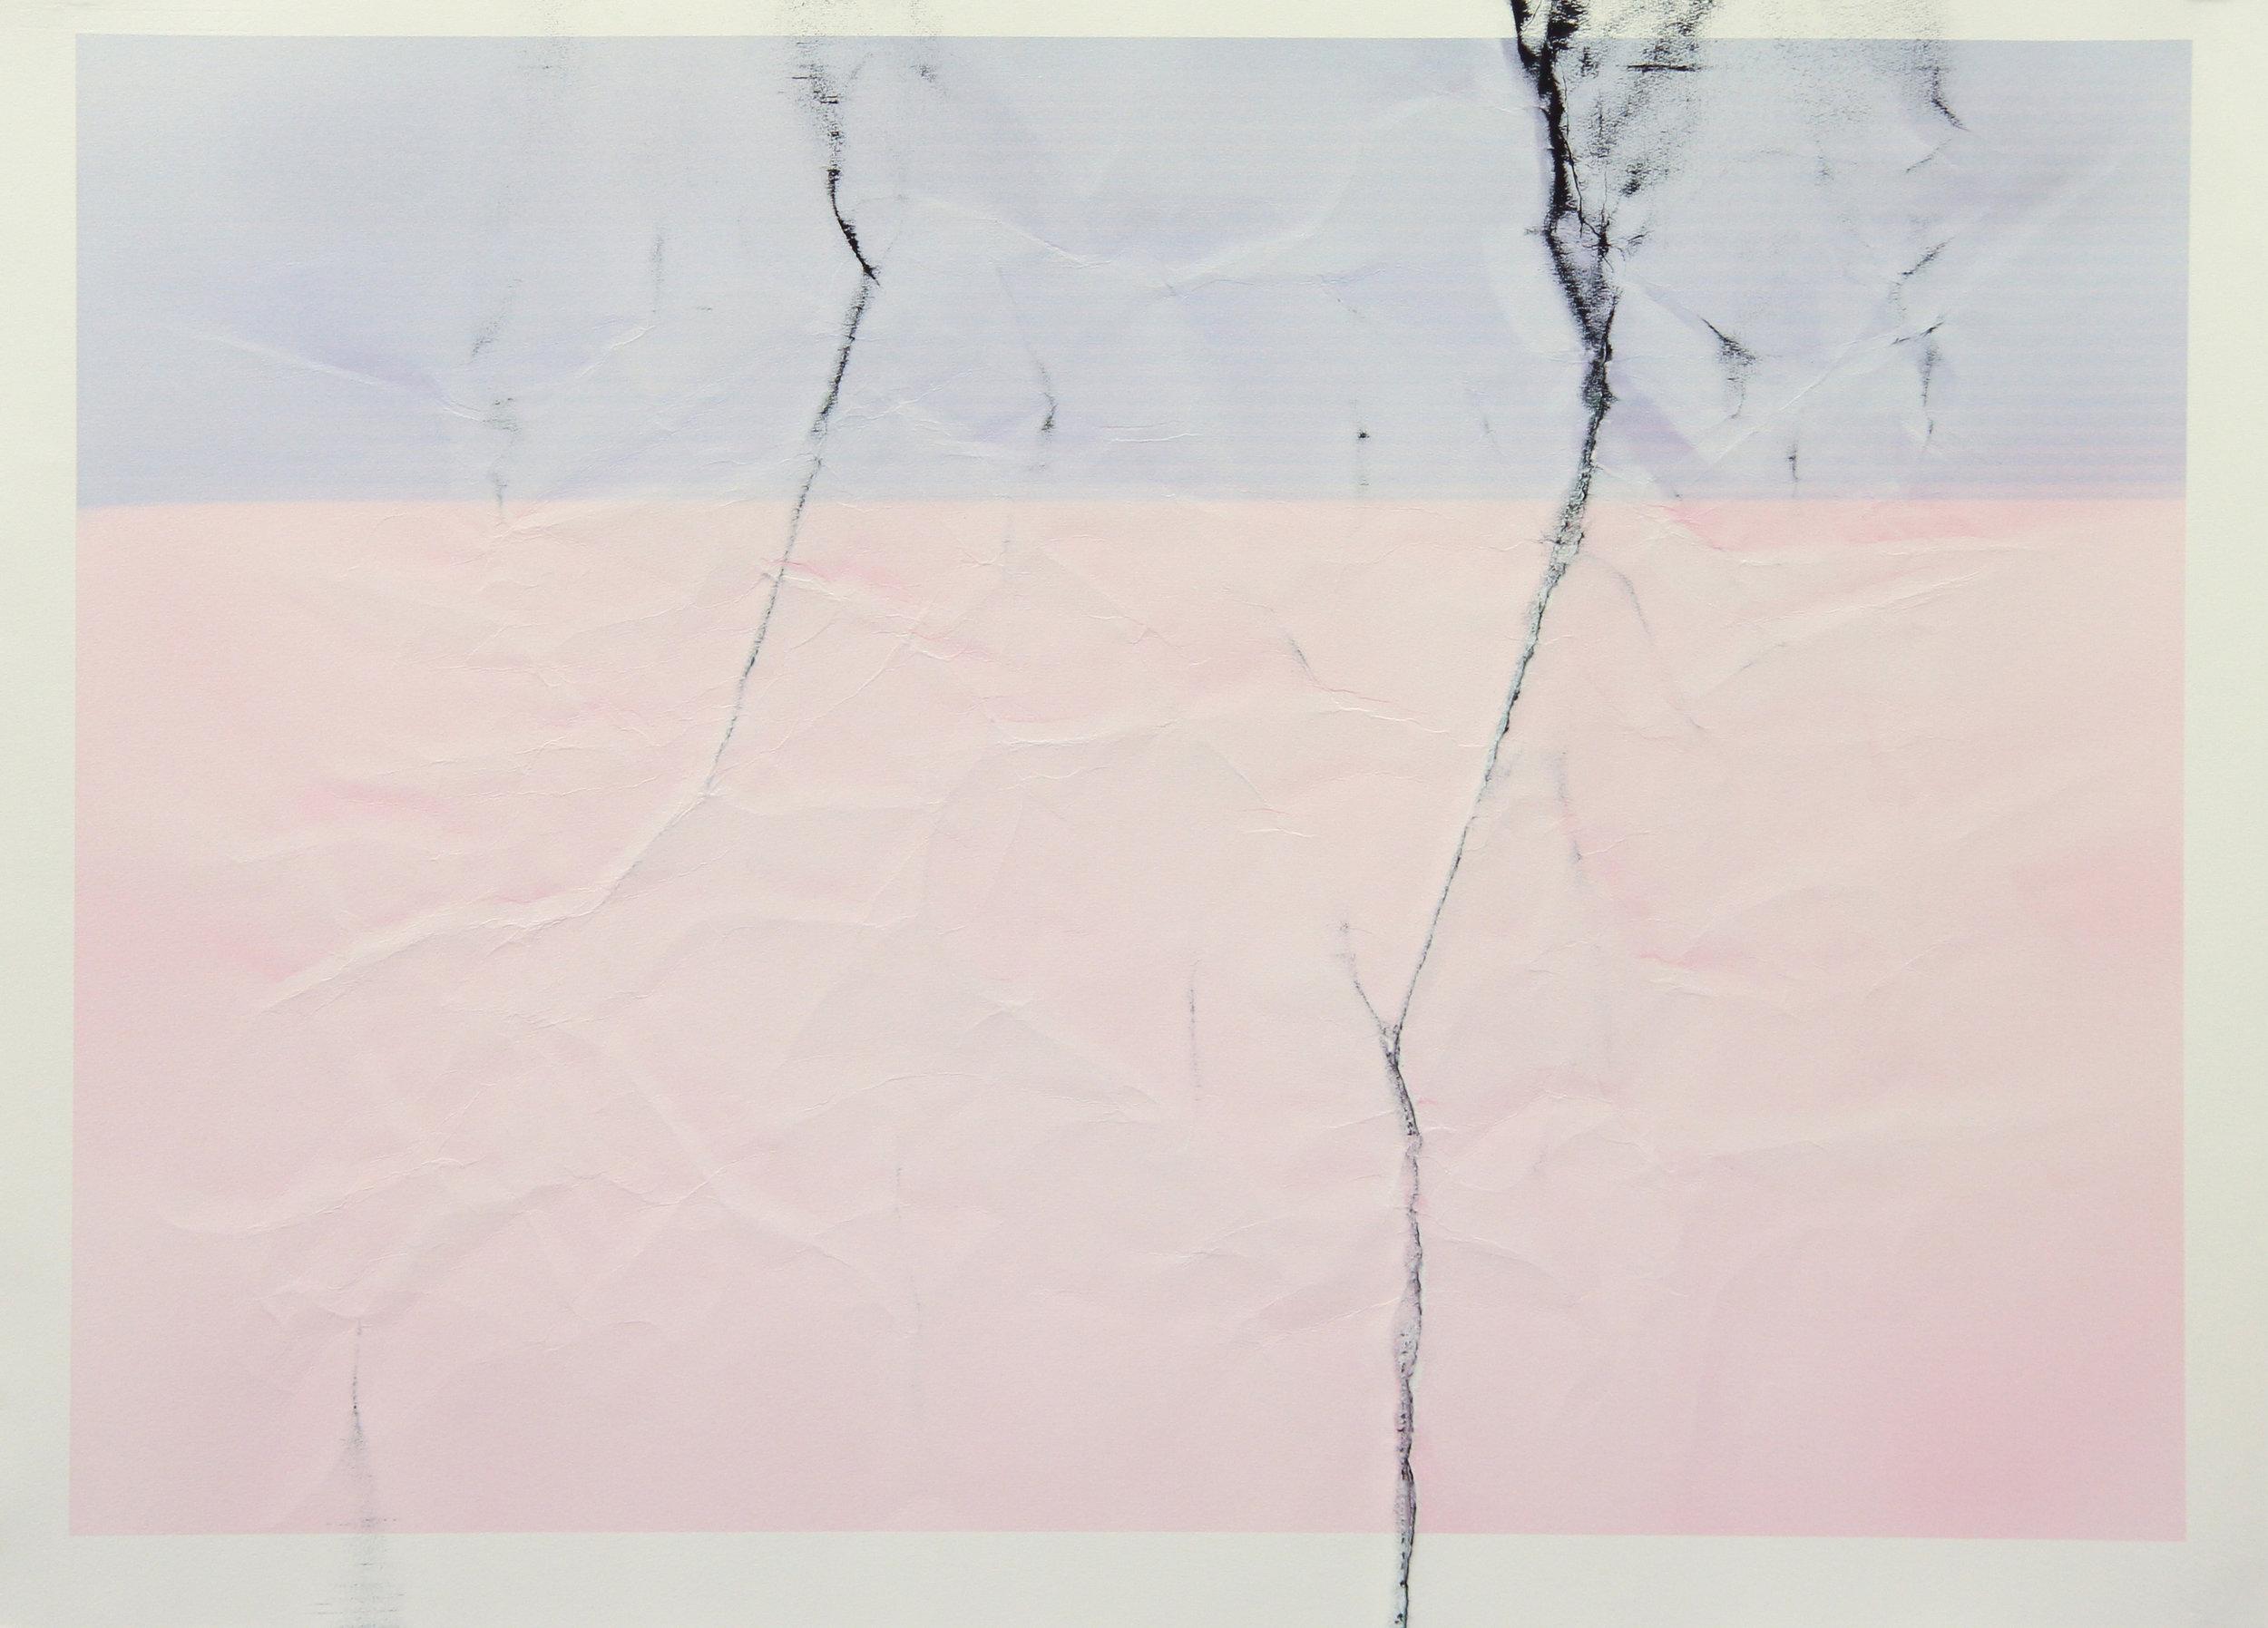 Tinted Headstrike #9, 2015 Unique giclée print, 107 x 78 cm